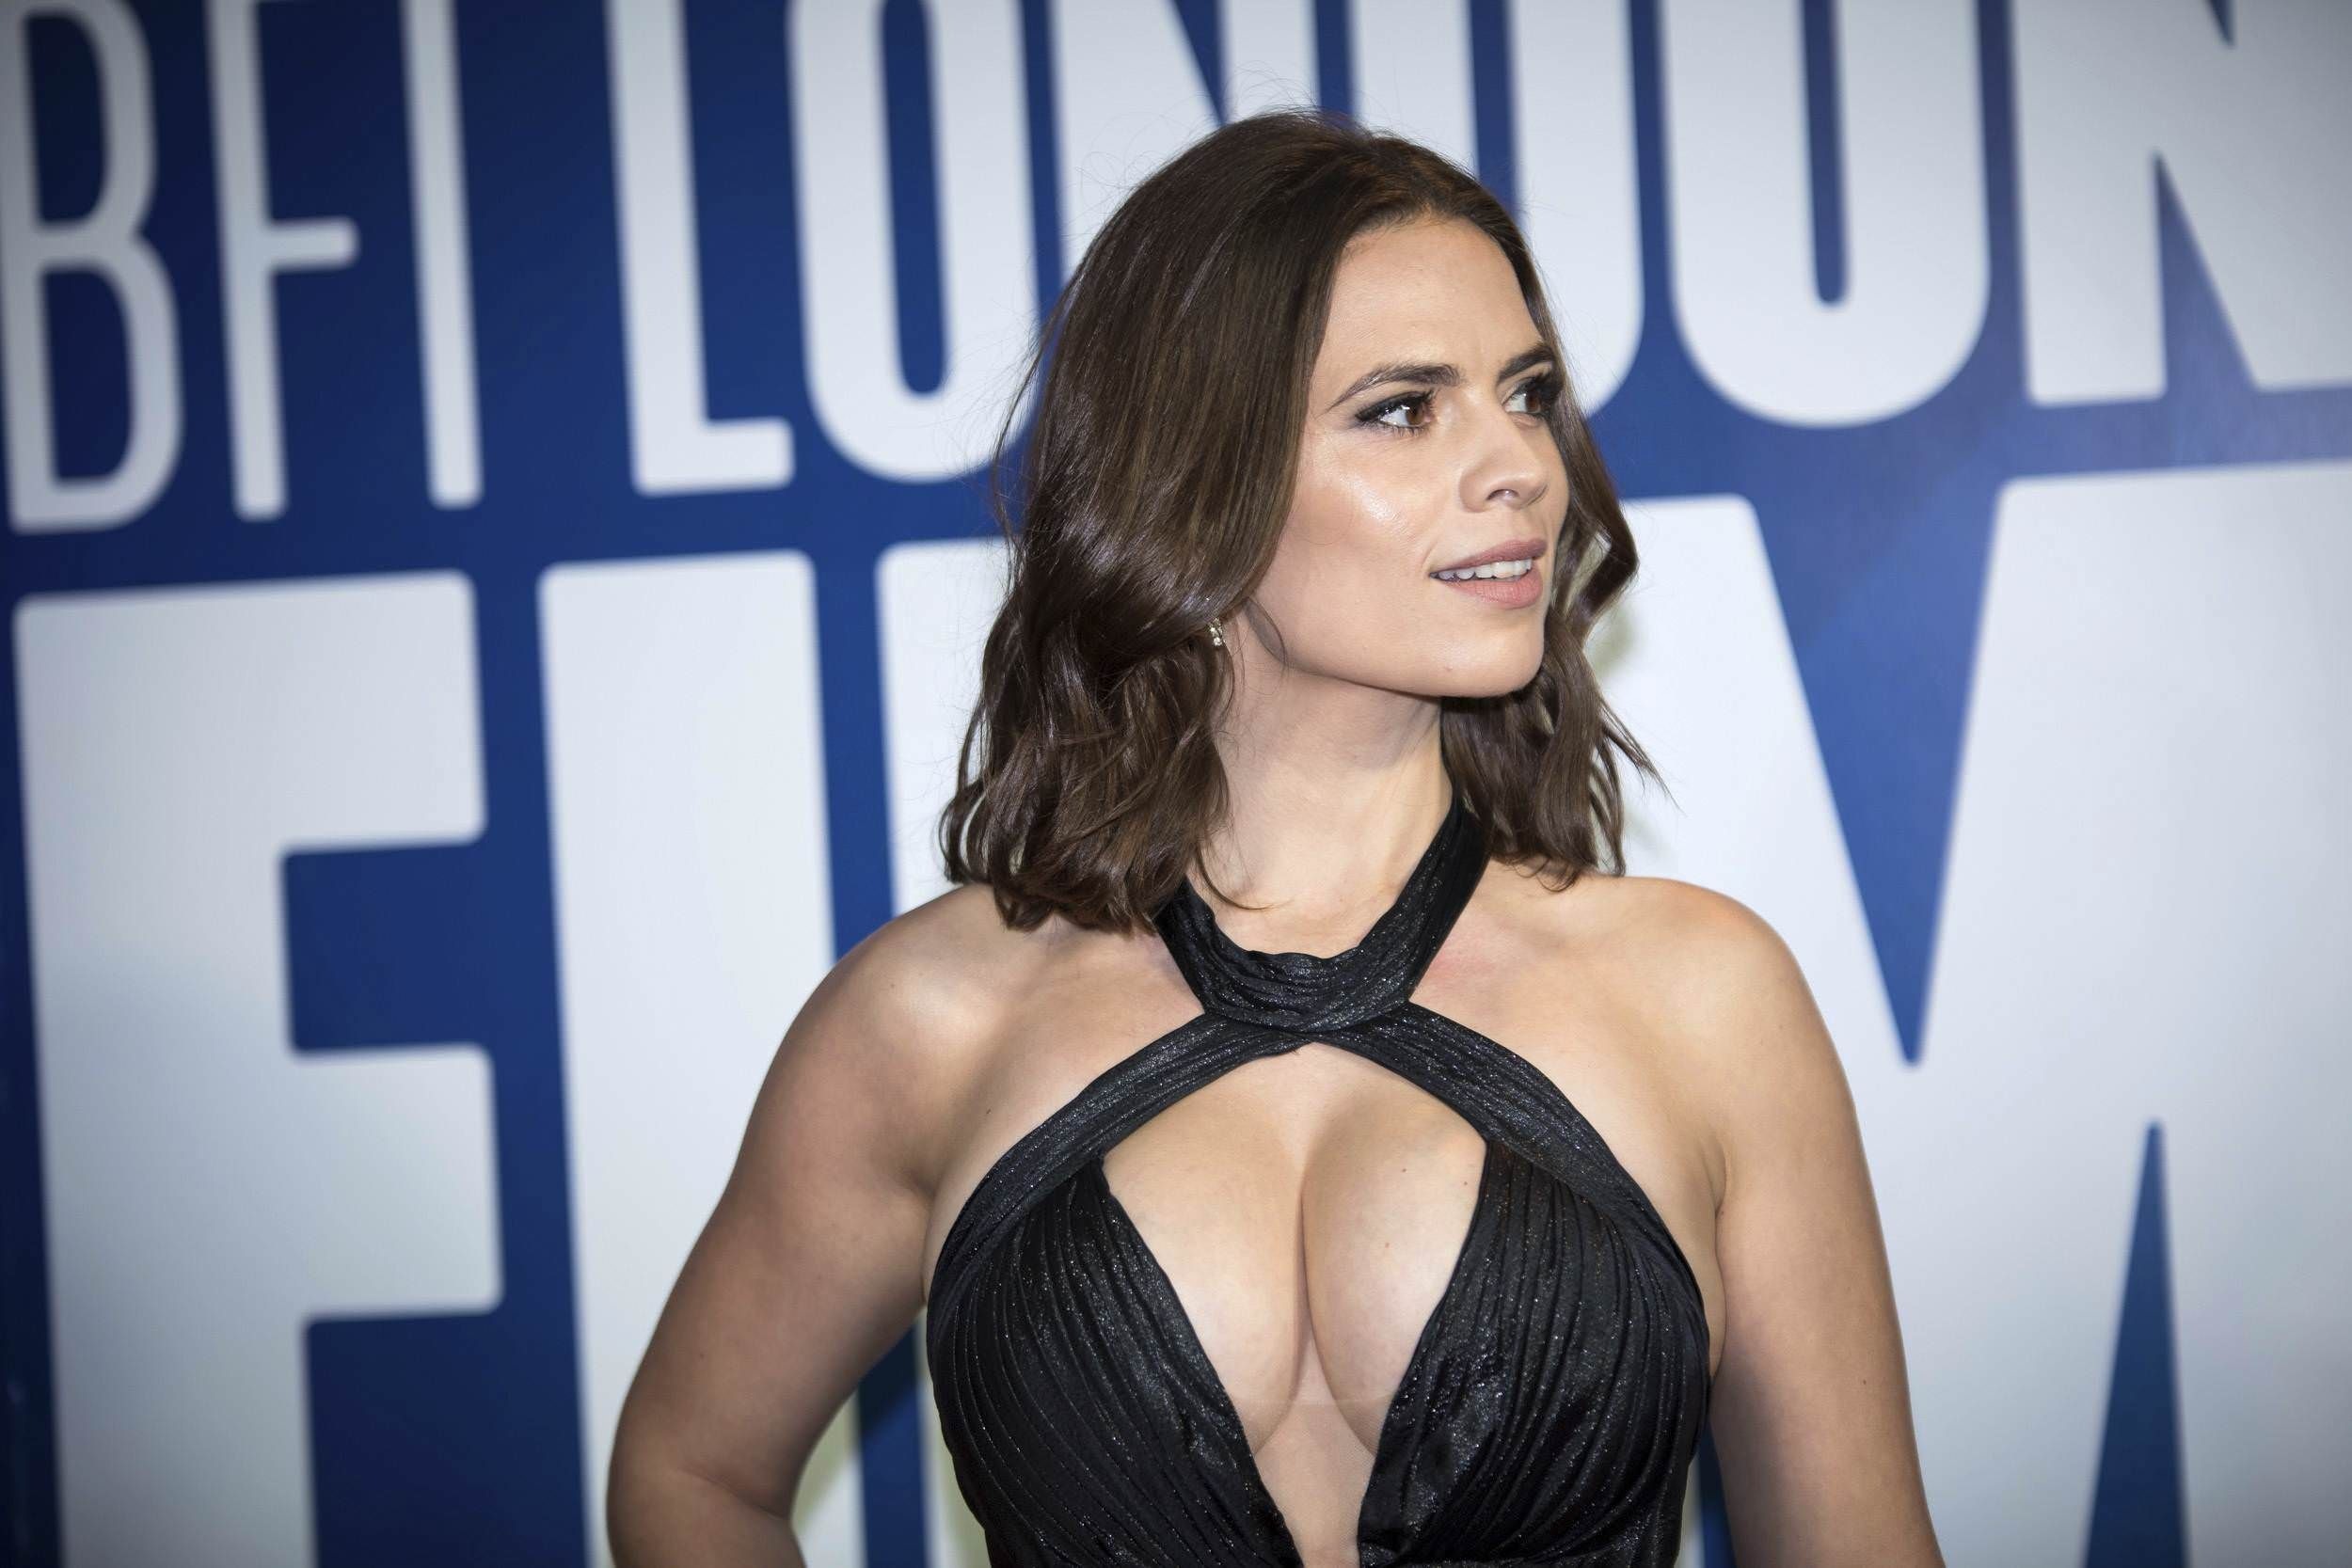 Celebrity Haley Ryder nude (54 photos), Topless, Paparazzi, Feet, cameltoe 2019